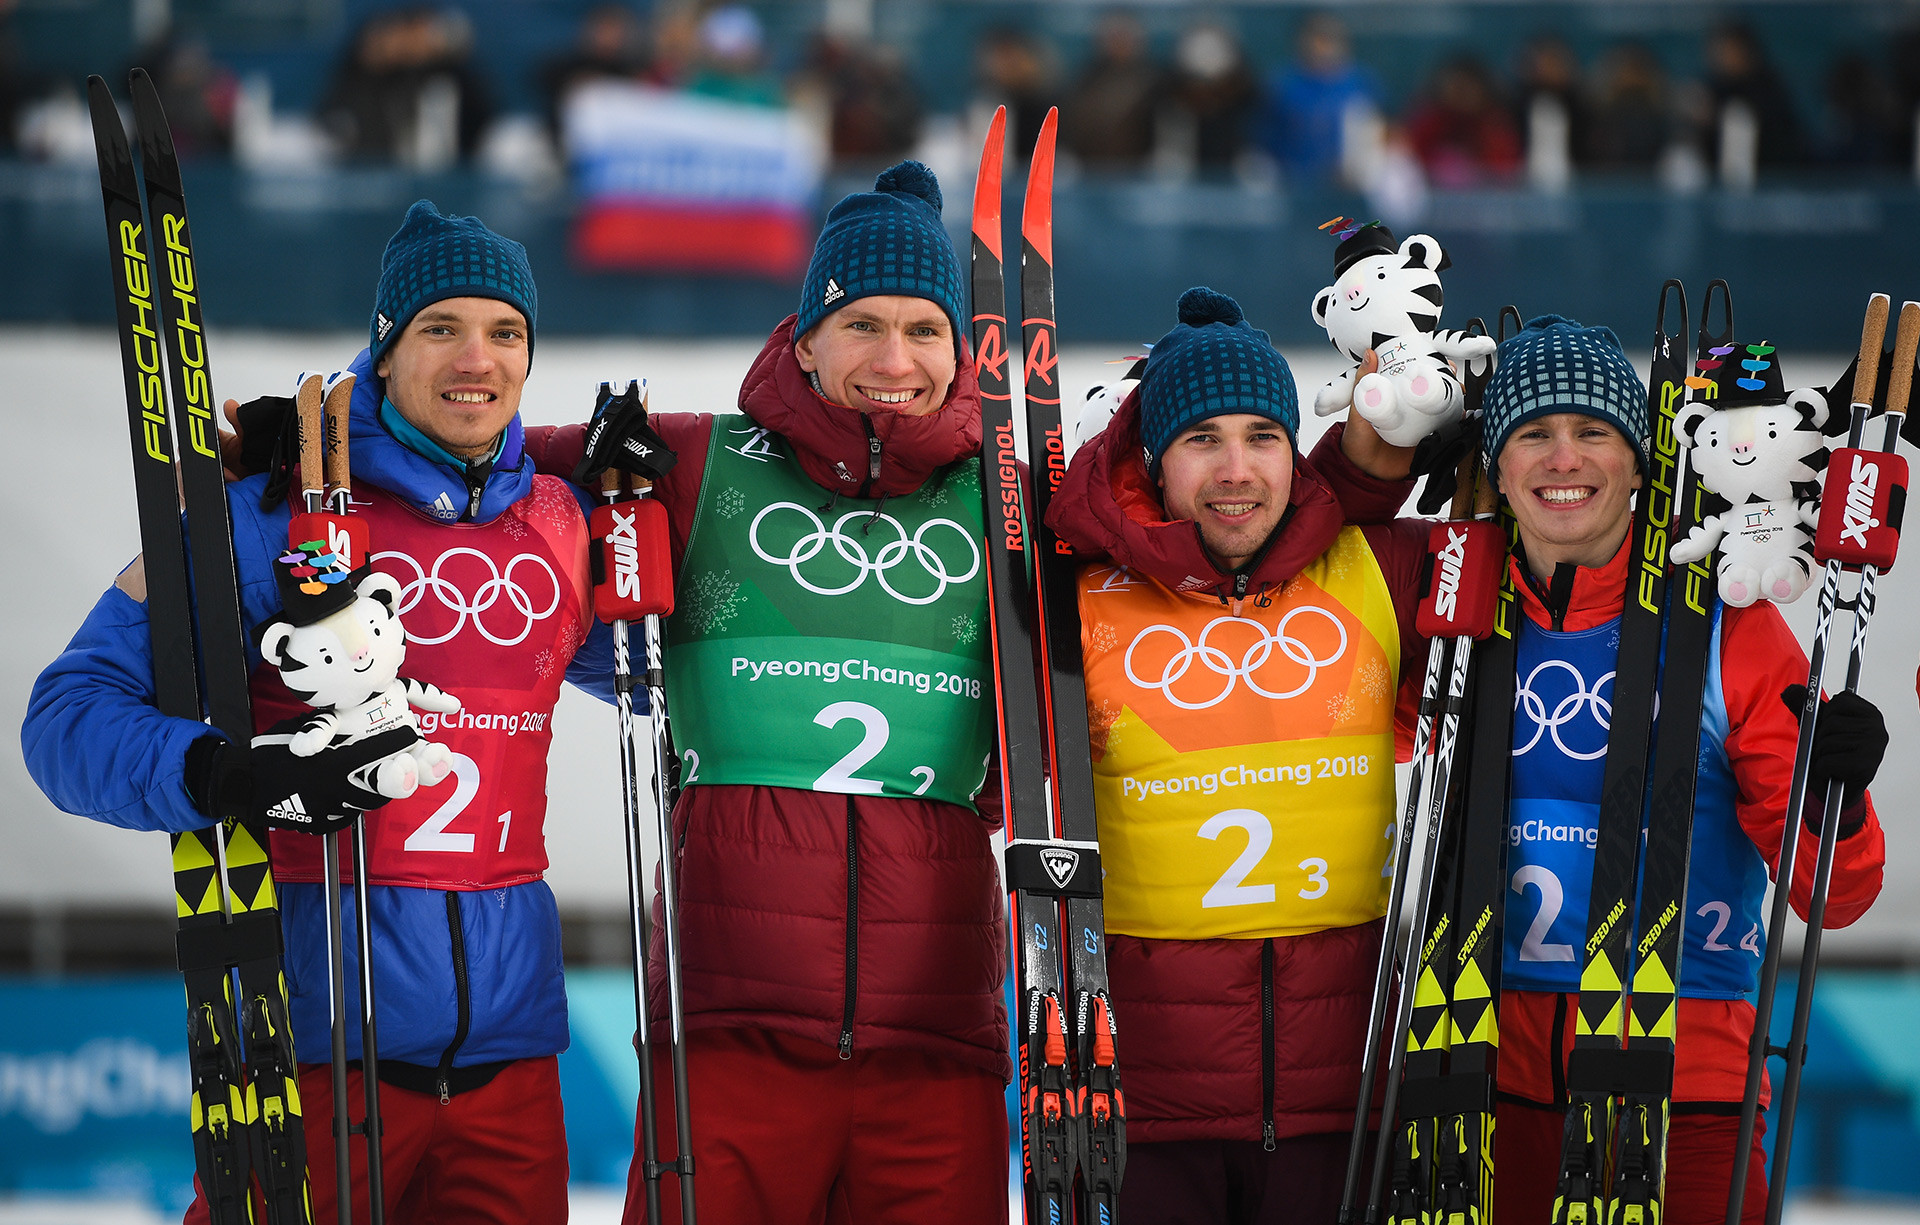 (слева надесно) Андреј Ларков, Александар Бољшунов, Алексеј Червоткин, Денис Спицов